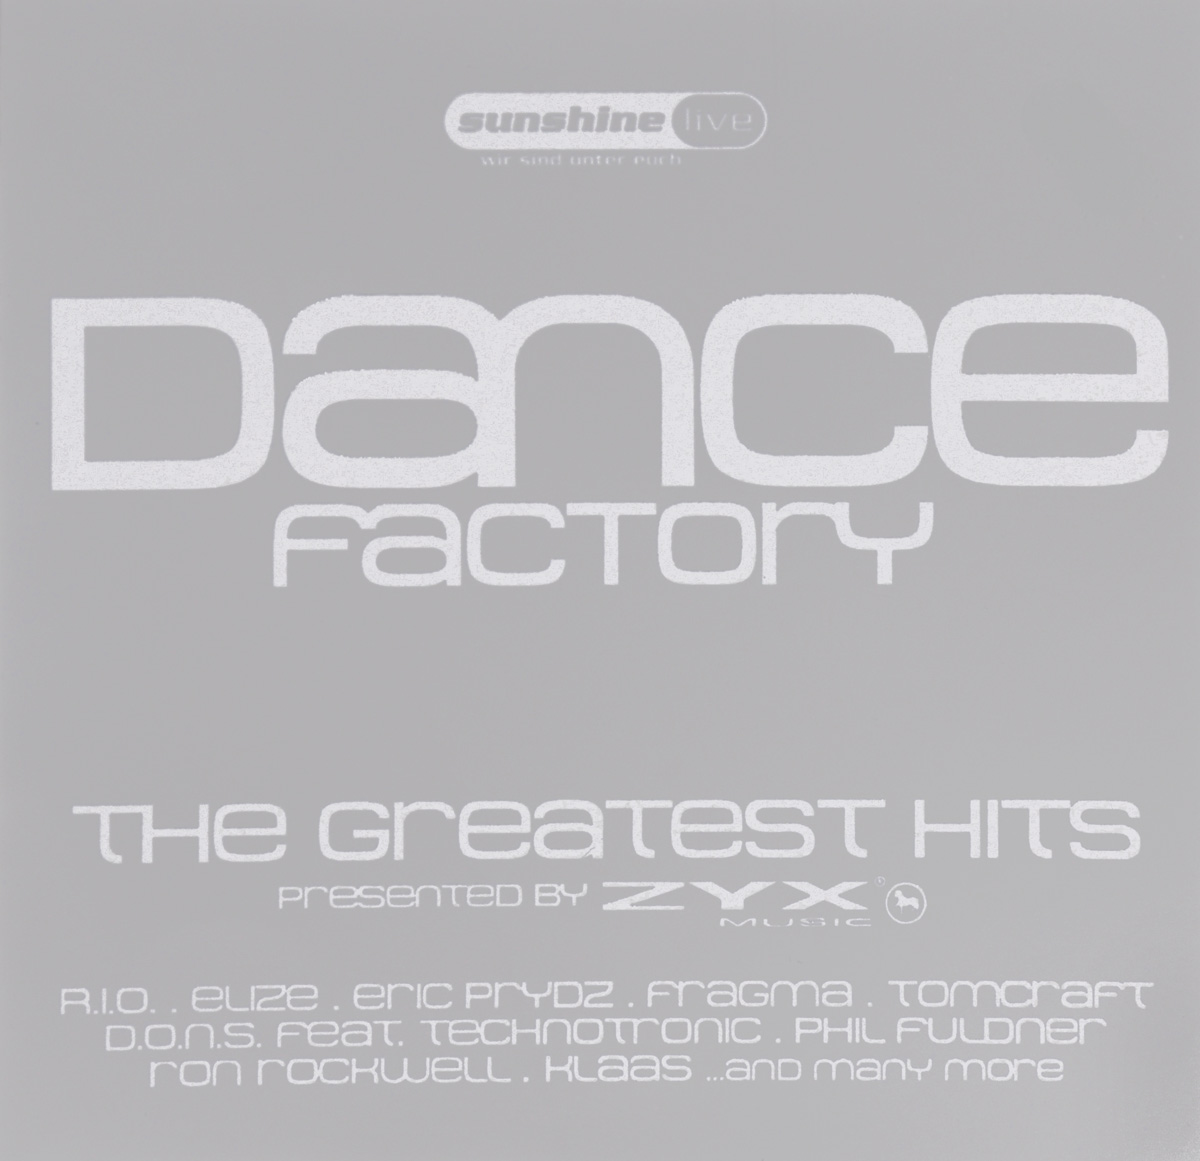 R.I.O.,EliZe,Эрик Прайдз,Jaybee,Нильс Ван Гог,Stfu,Джош Джексон,Jansen,Пэрси Дэйк,De-Grees,DJ Tomcraft,D.O.N.S.,Technotronic,Фил Фулднер,Nightwatchers,Blank & Jones,Тиллманн Ахмечер,BBE,Wonderland Avenue,Emmanuel Top Dance Factory. The Greatest Hits (2 CD) dance top hits 6 4 cd